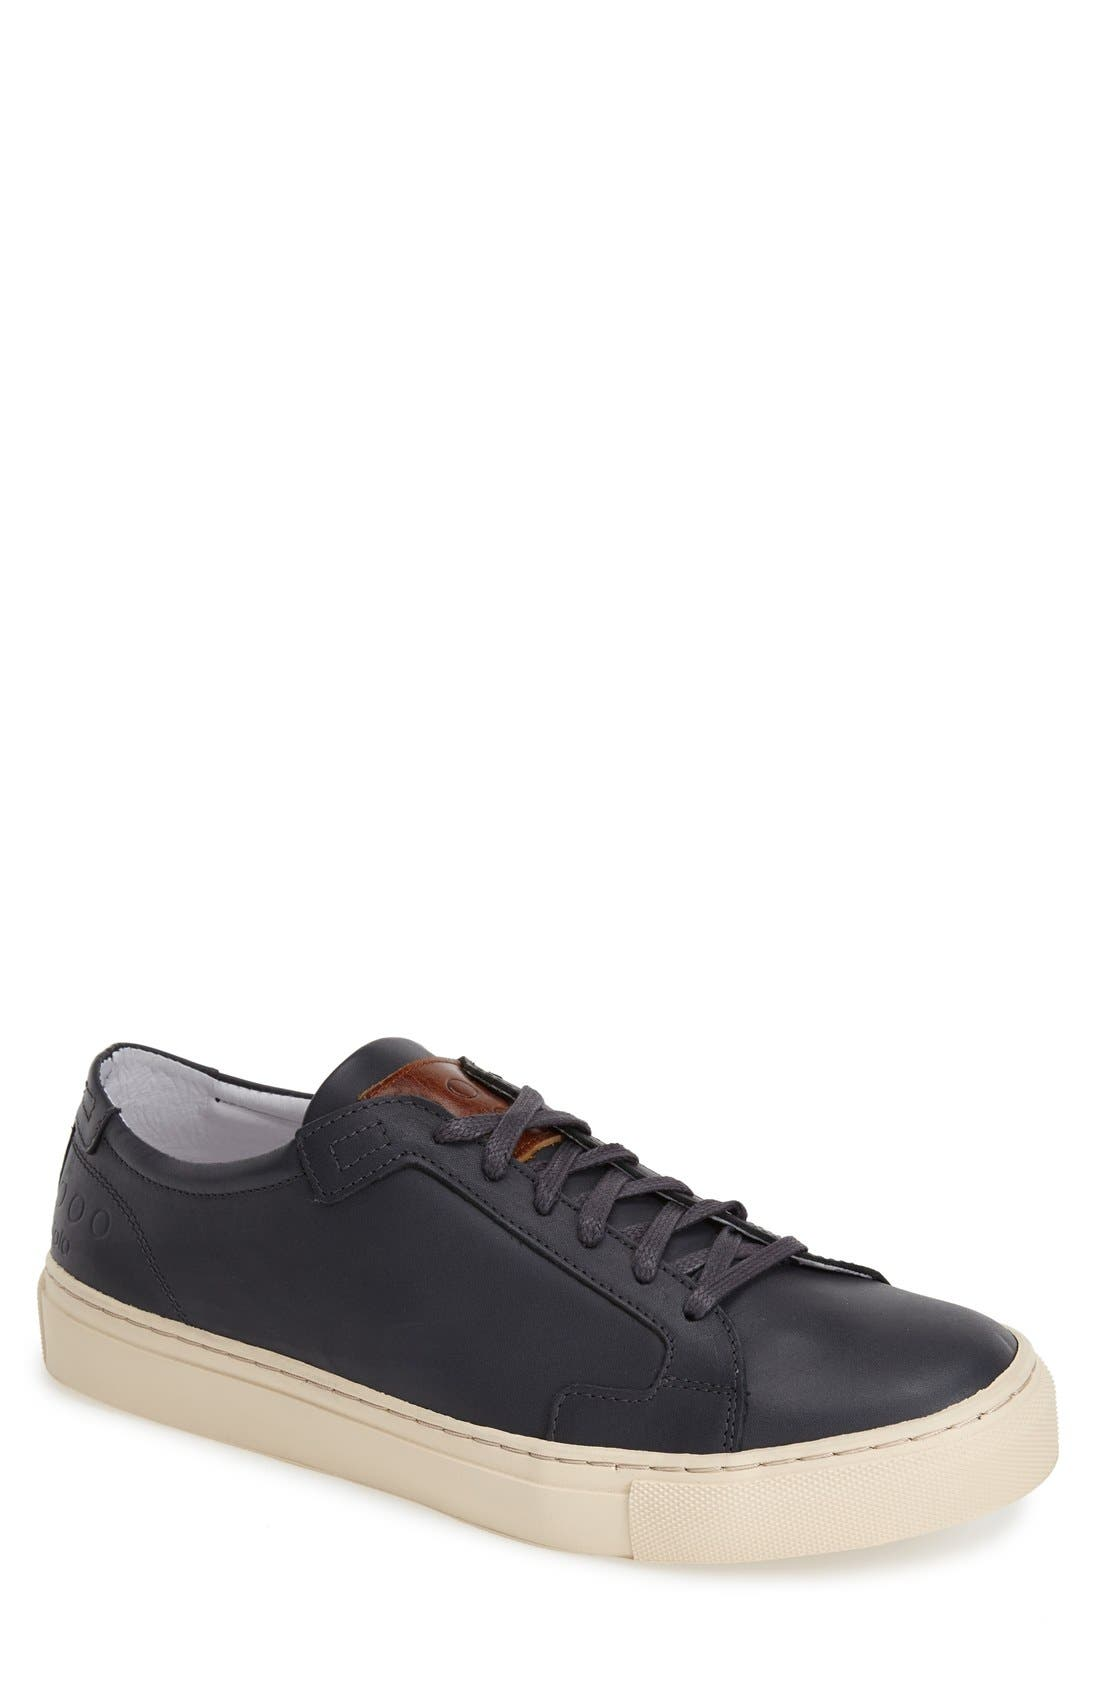 PIOLA,                             'Ica' Sneaker,                             Main thumbnail 1, color,                             029